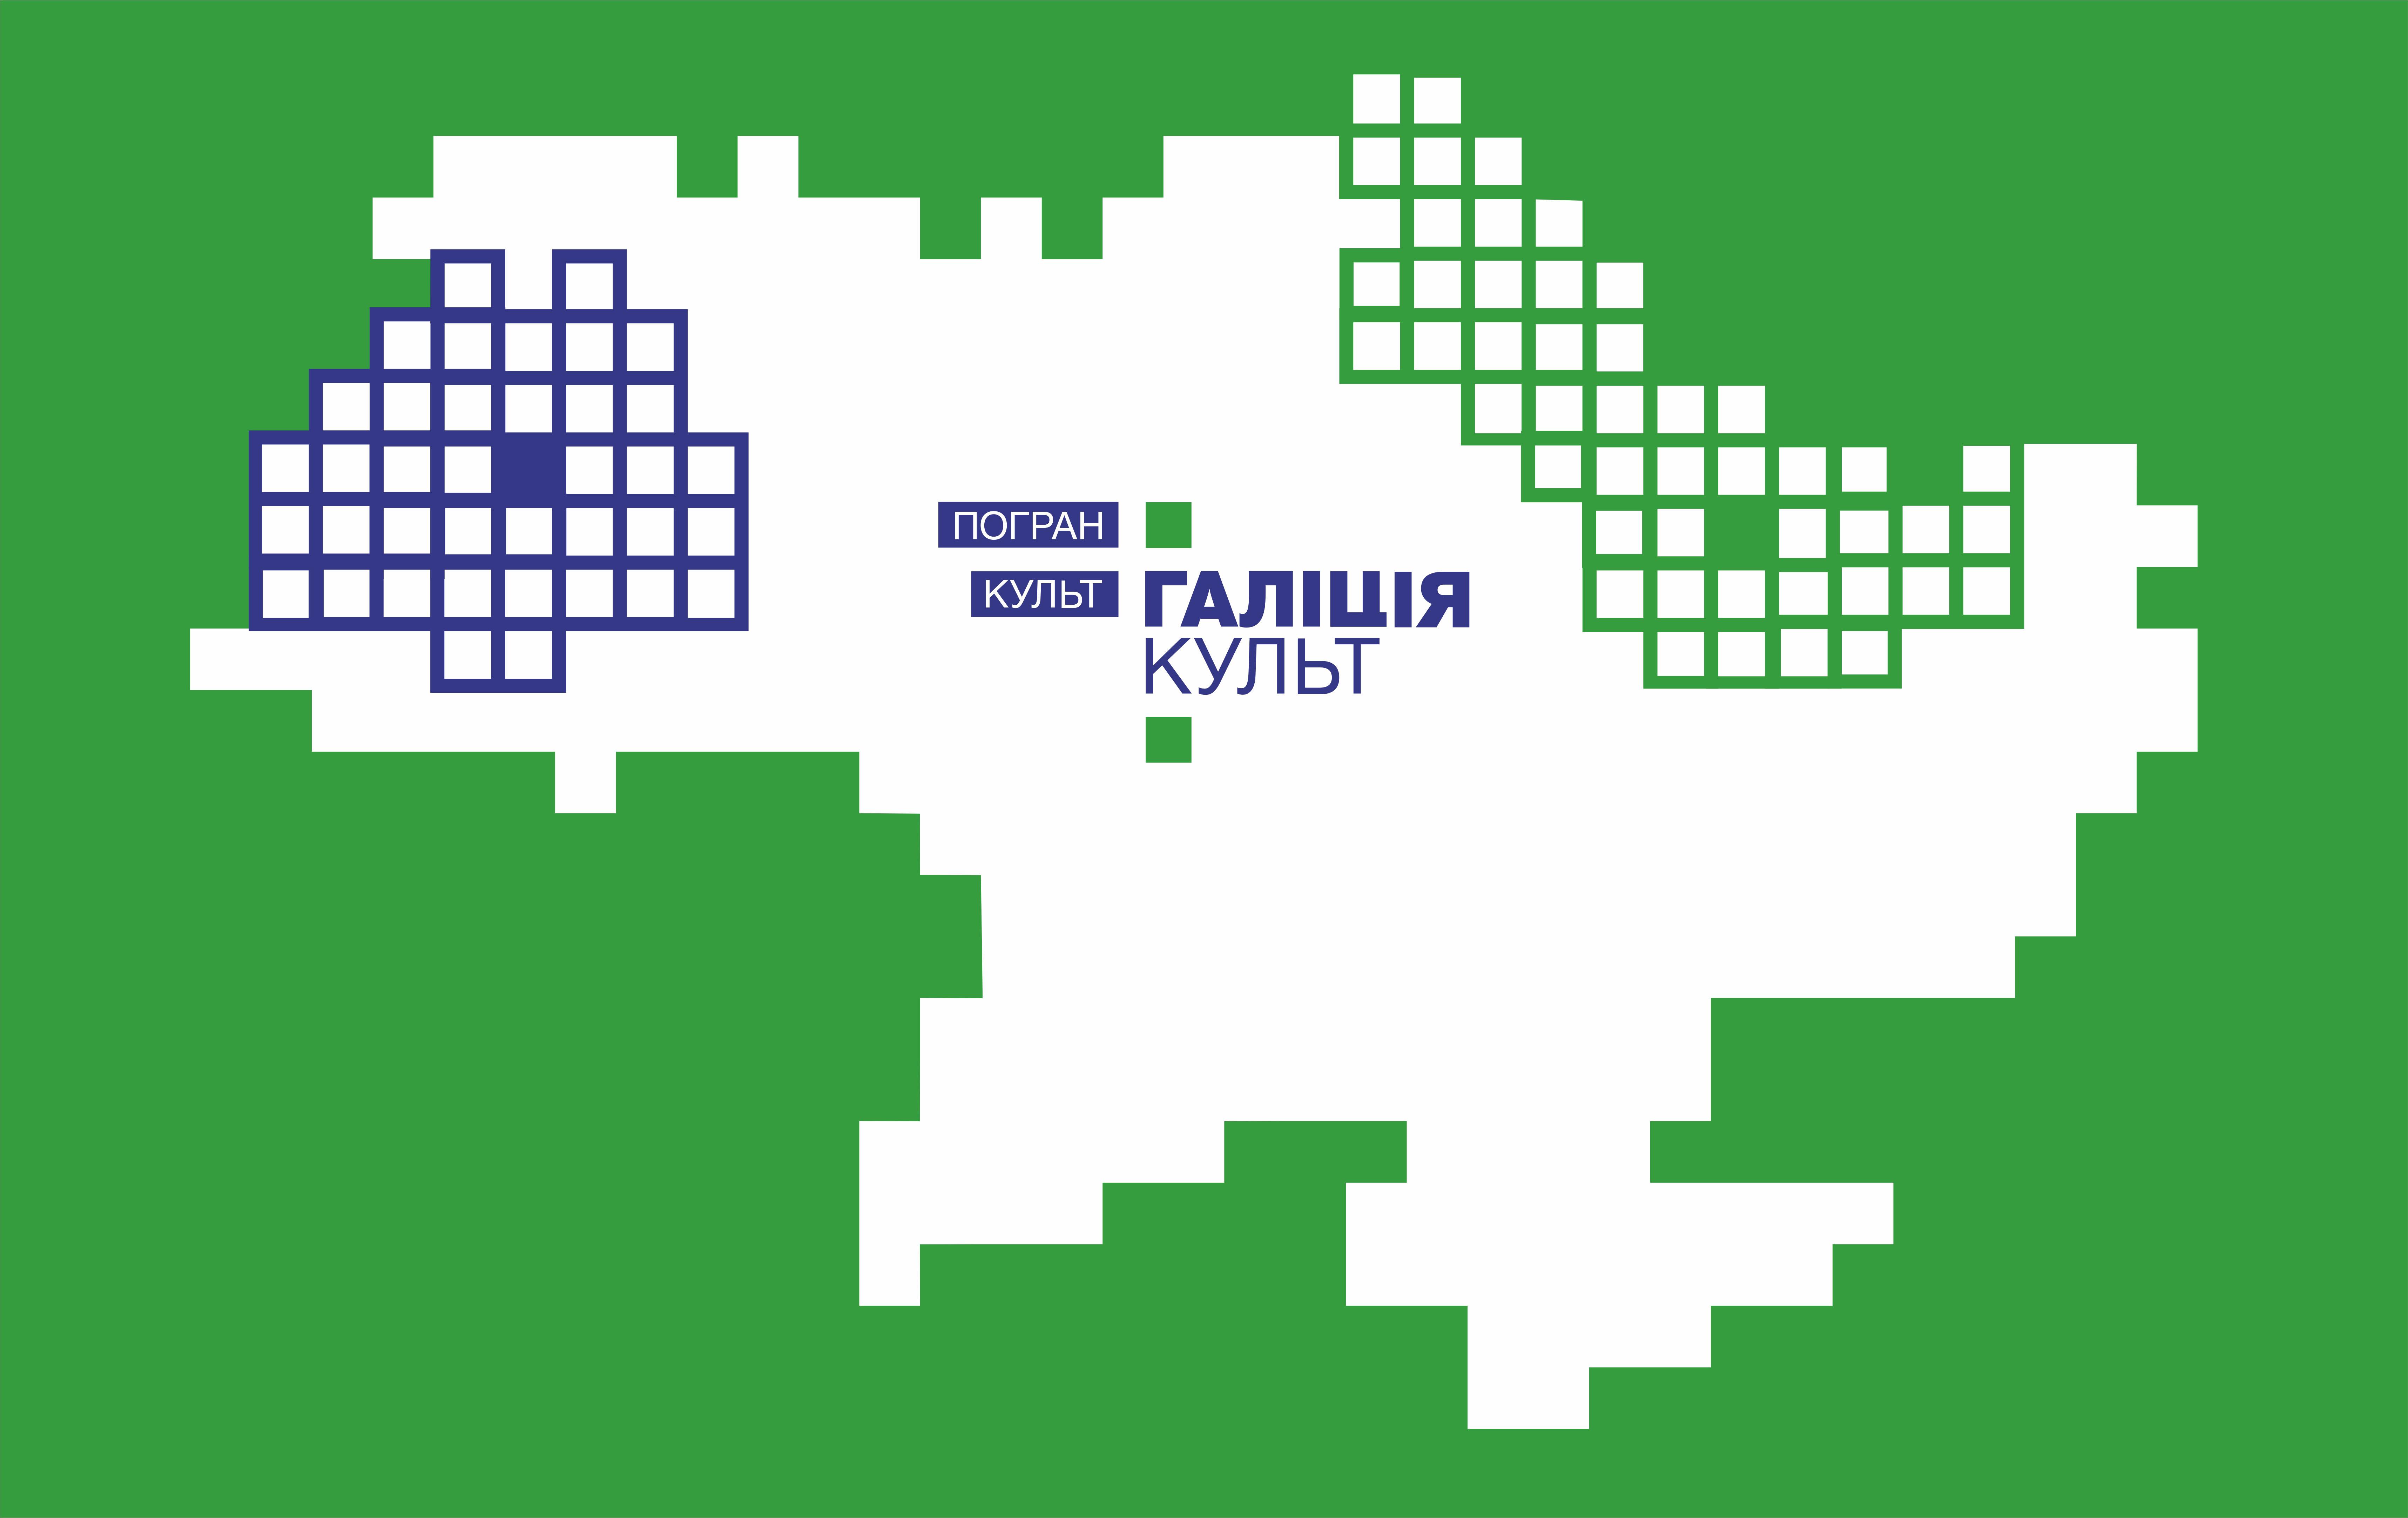 Культурный форум «ПогранКульт: ГалицияКульт»